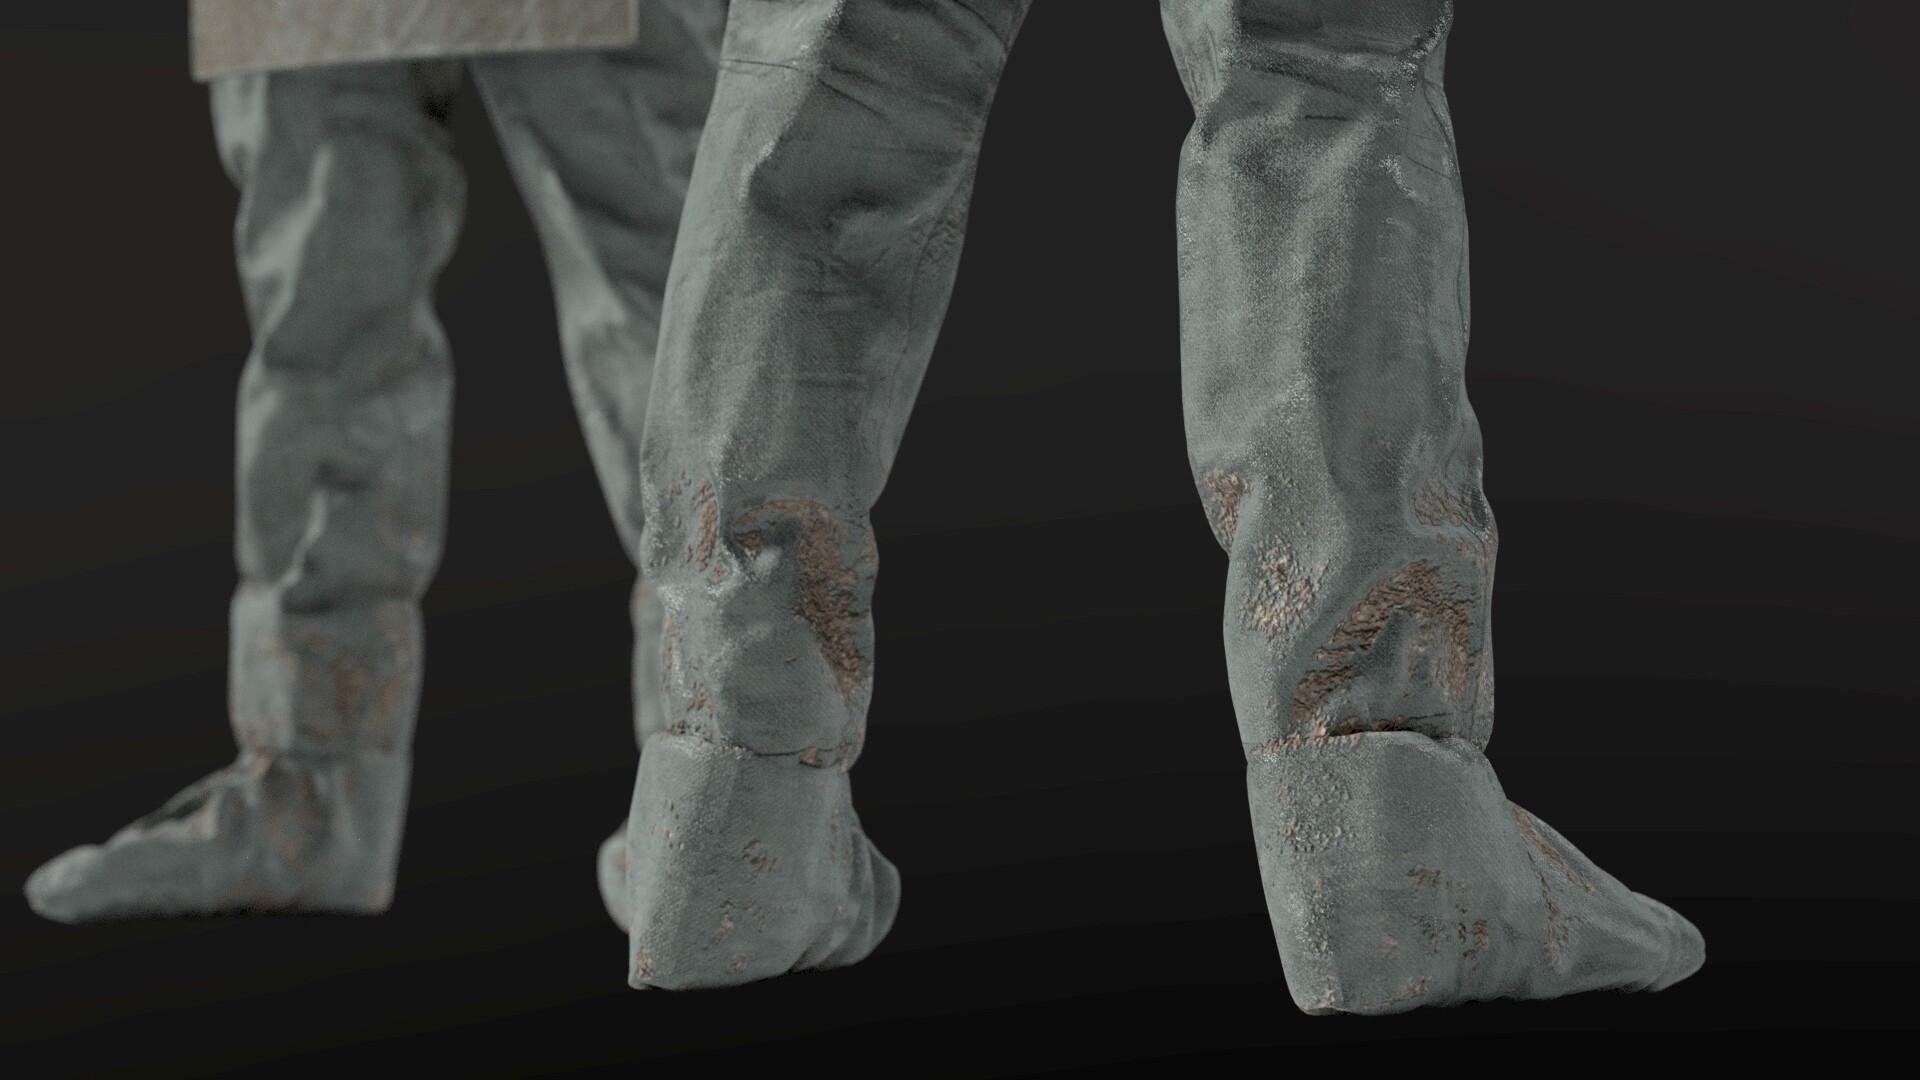 ArtStation - Chernobyl Liquidator Suit, Albin Merle